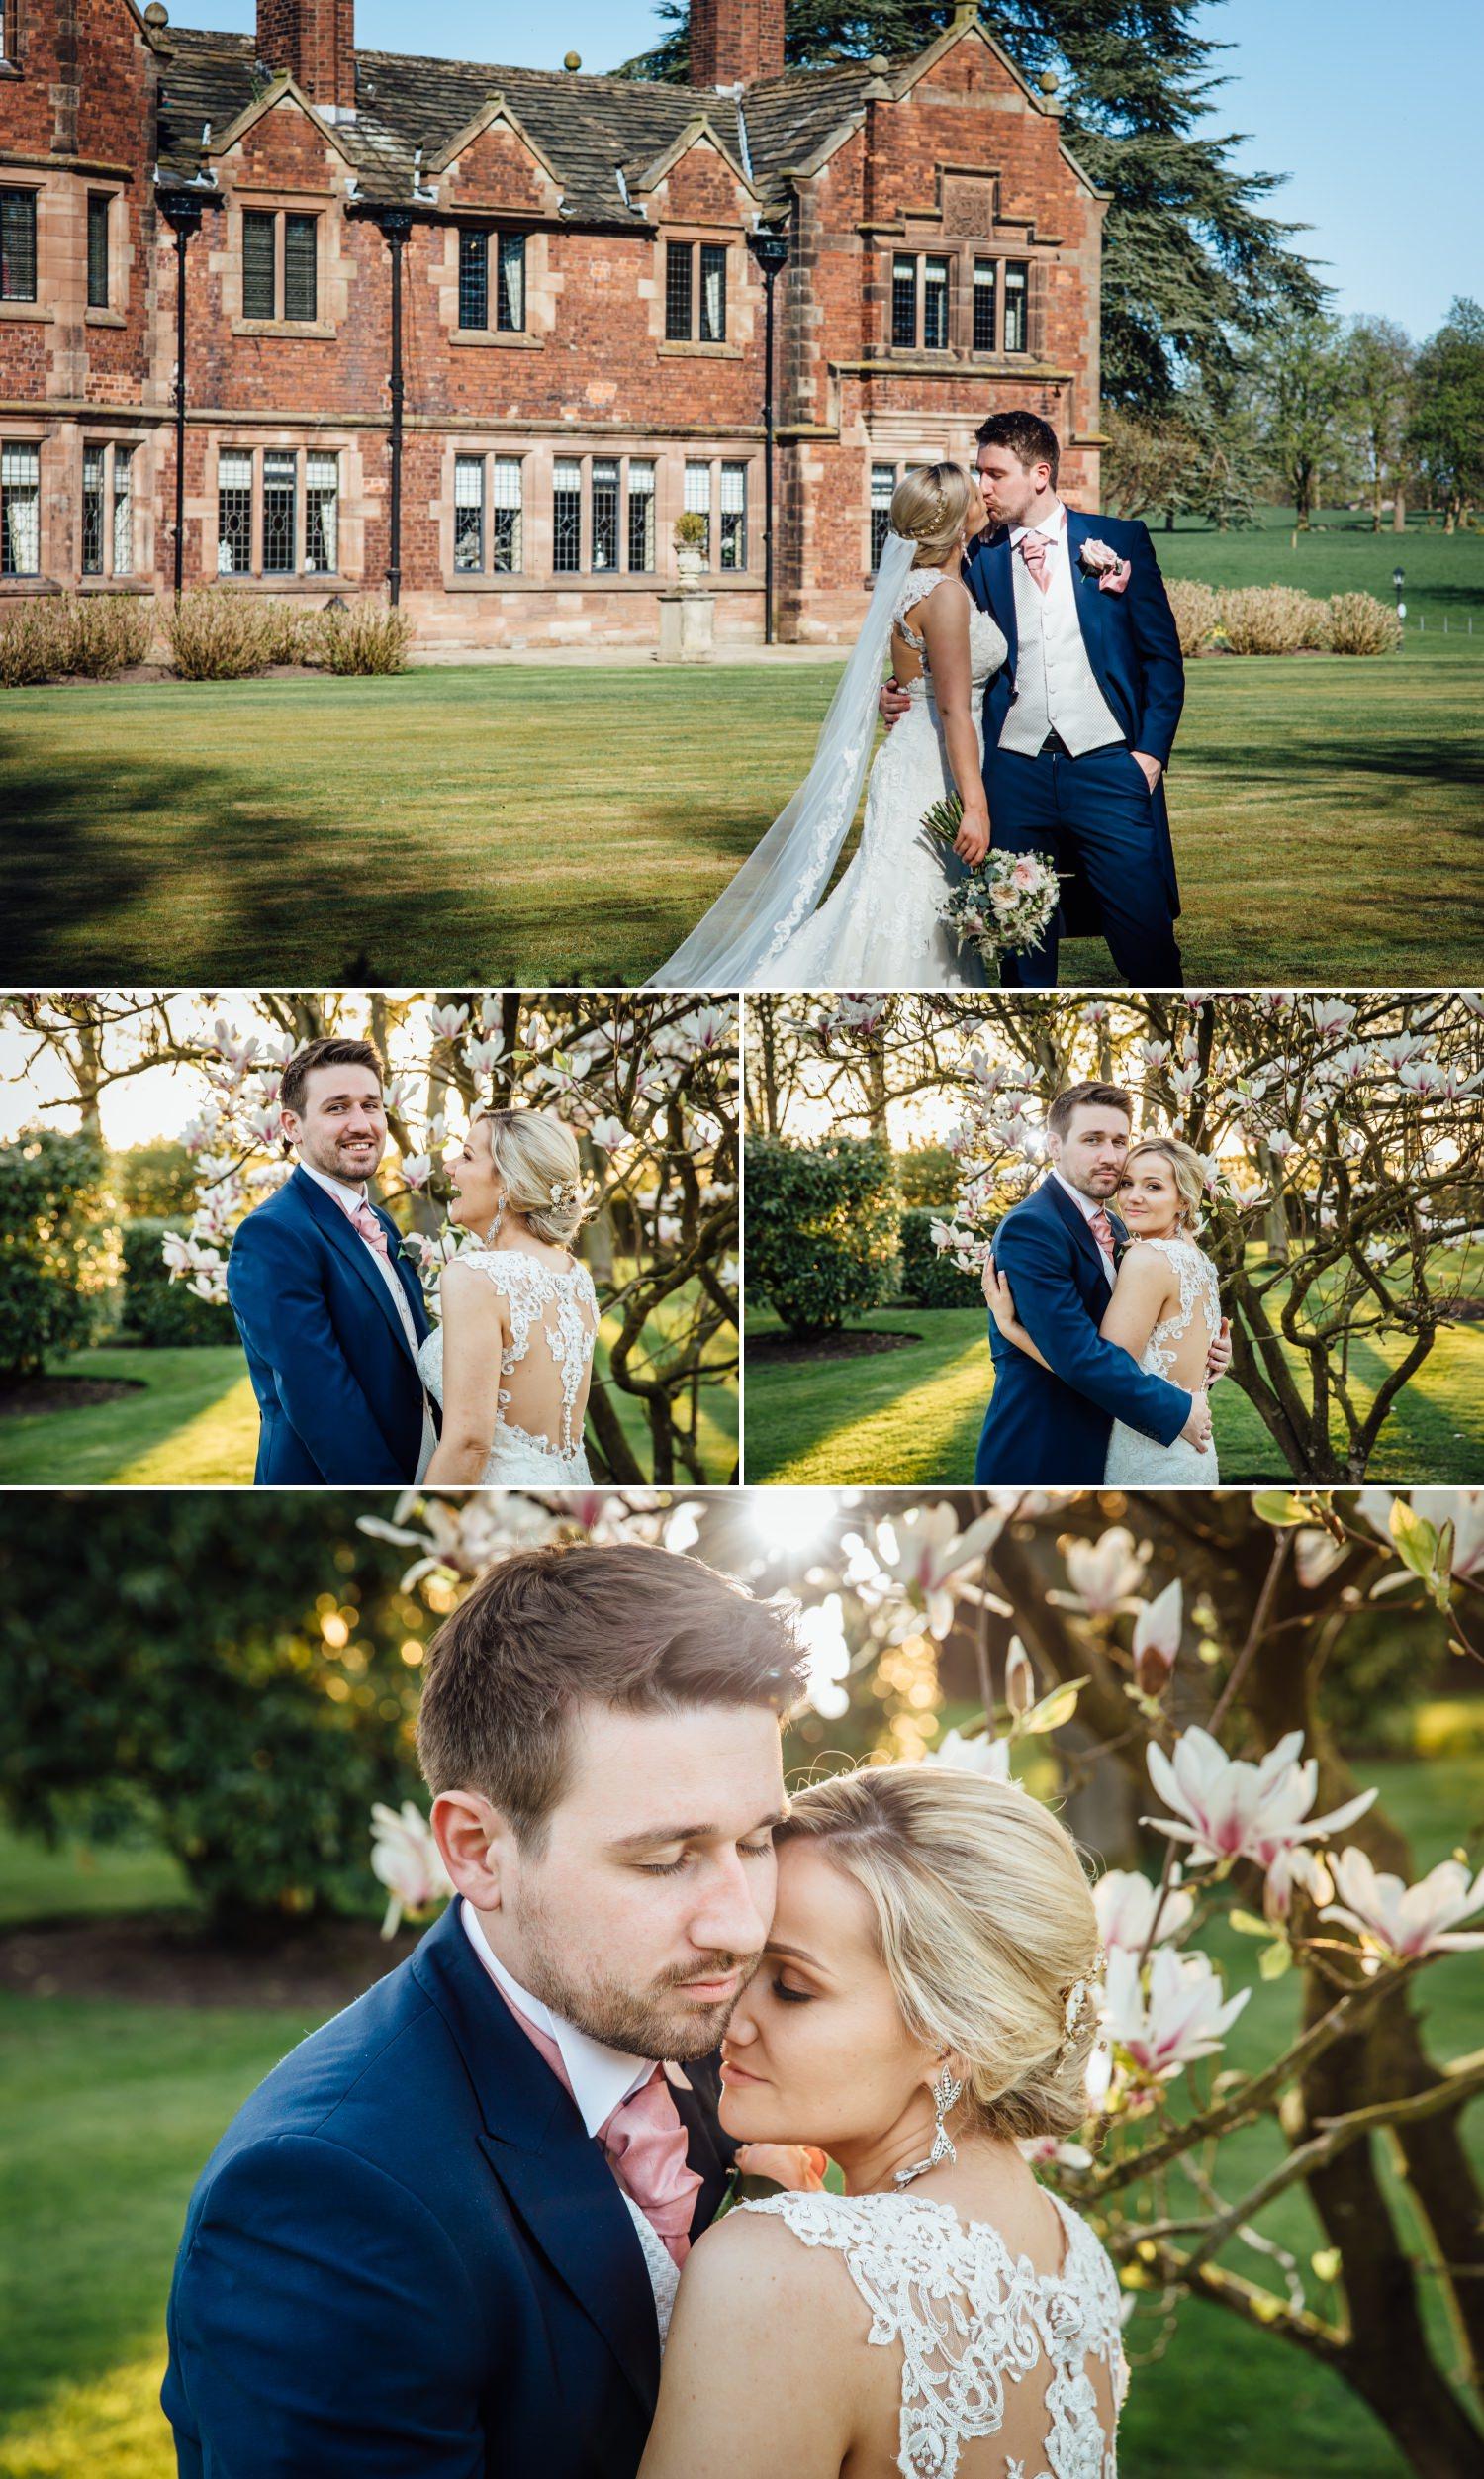 wedding photography couple portraits at Cheshire venue Colshaw Hall